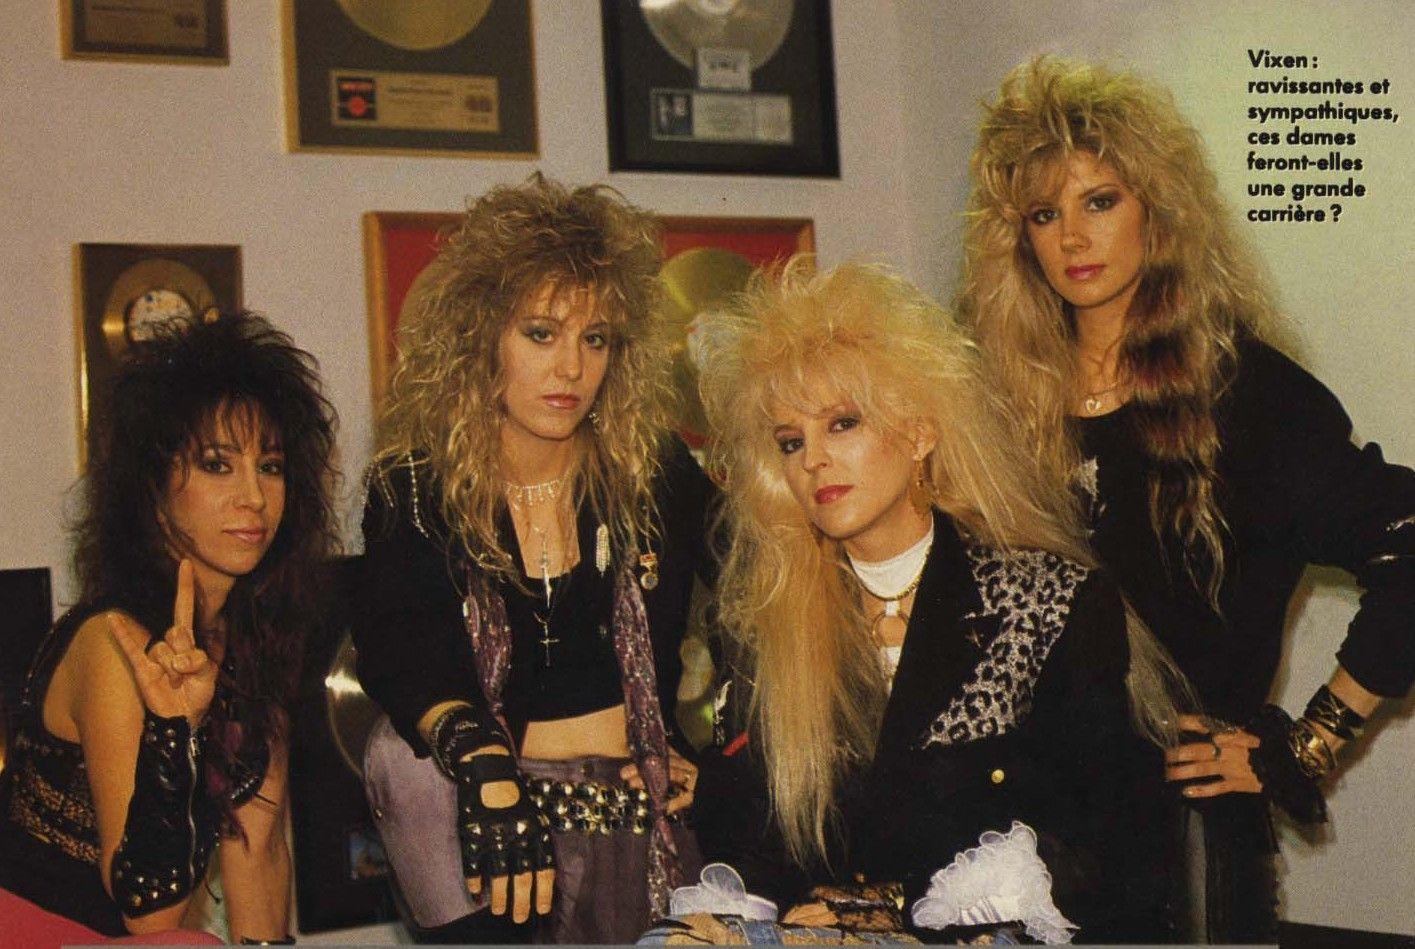 Hair That Rocked Vixen! Hair metal bands, Female rock